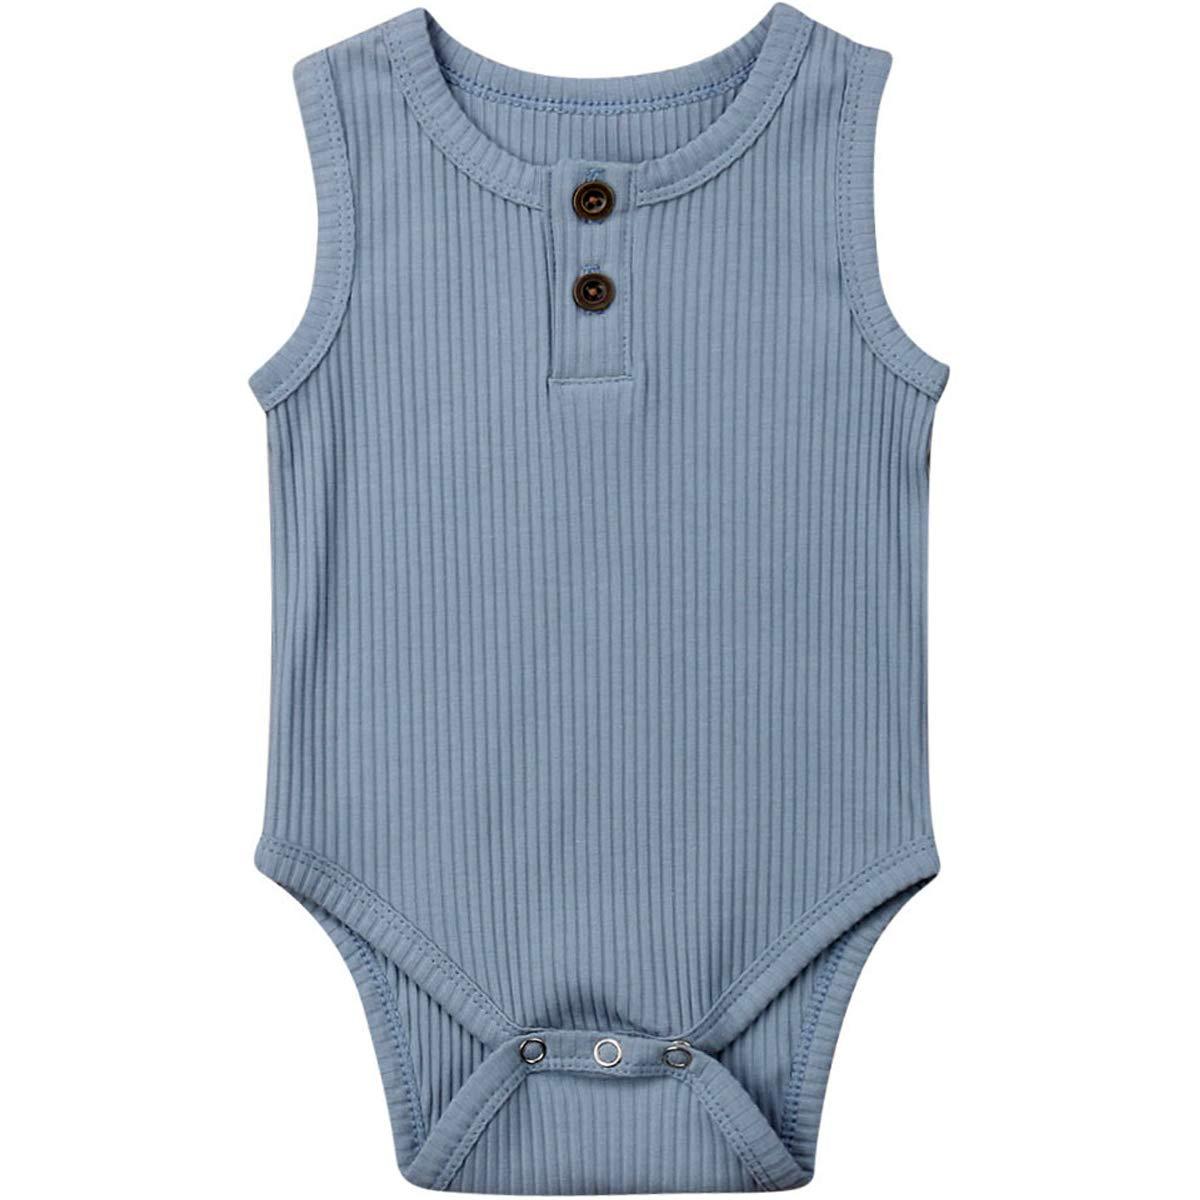 Kuriozud Newborn Infant Unisex Baby Boy Girl Sleeveless Button Solid Romper Bodysuit One Piece Jumpsuit Outfit Clothes